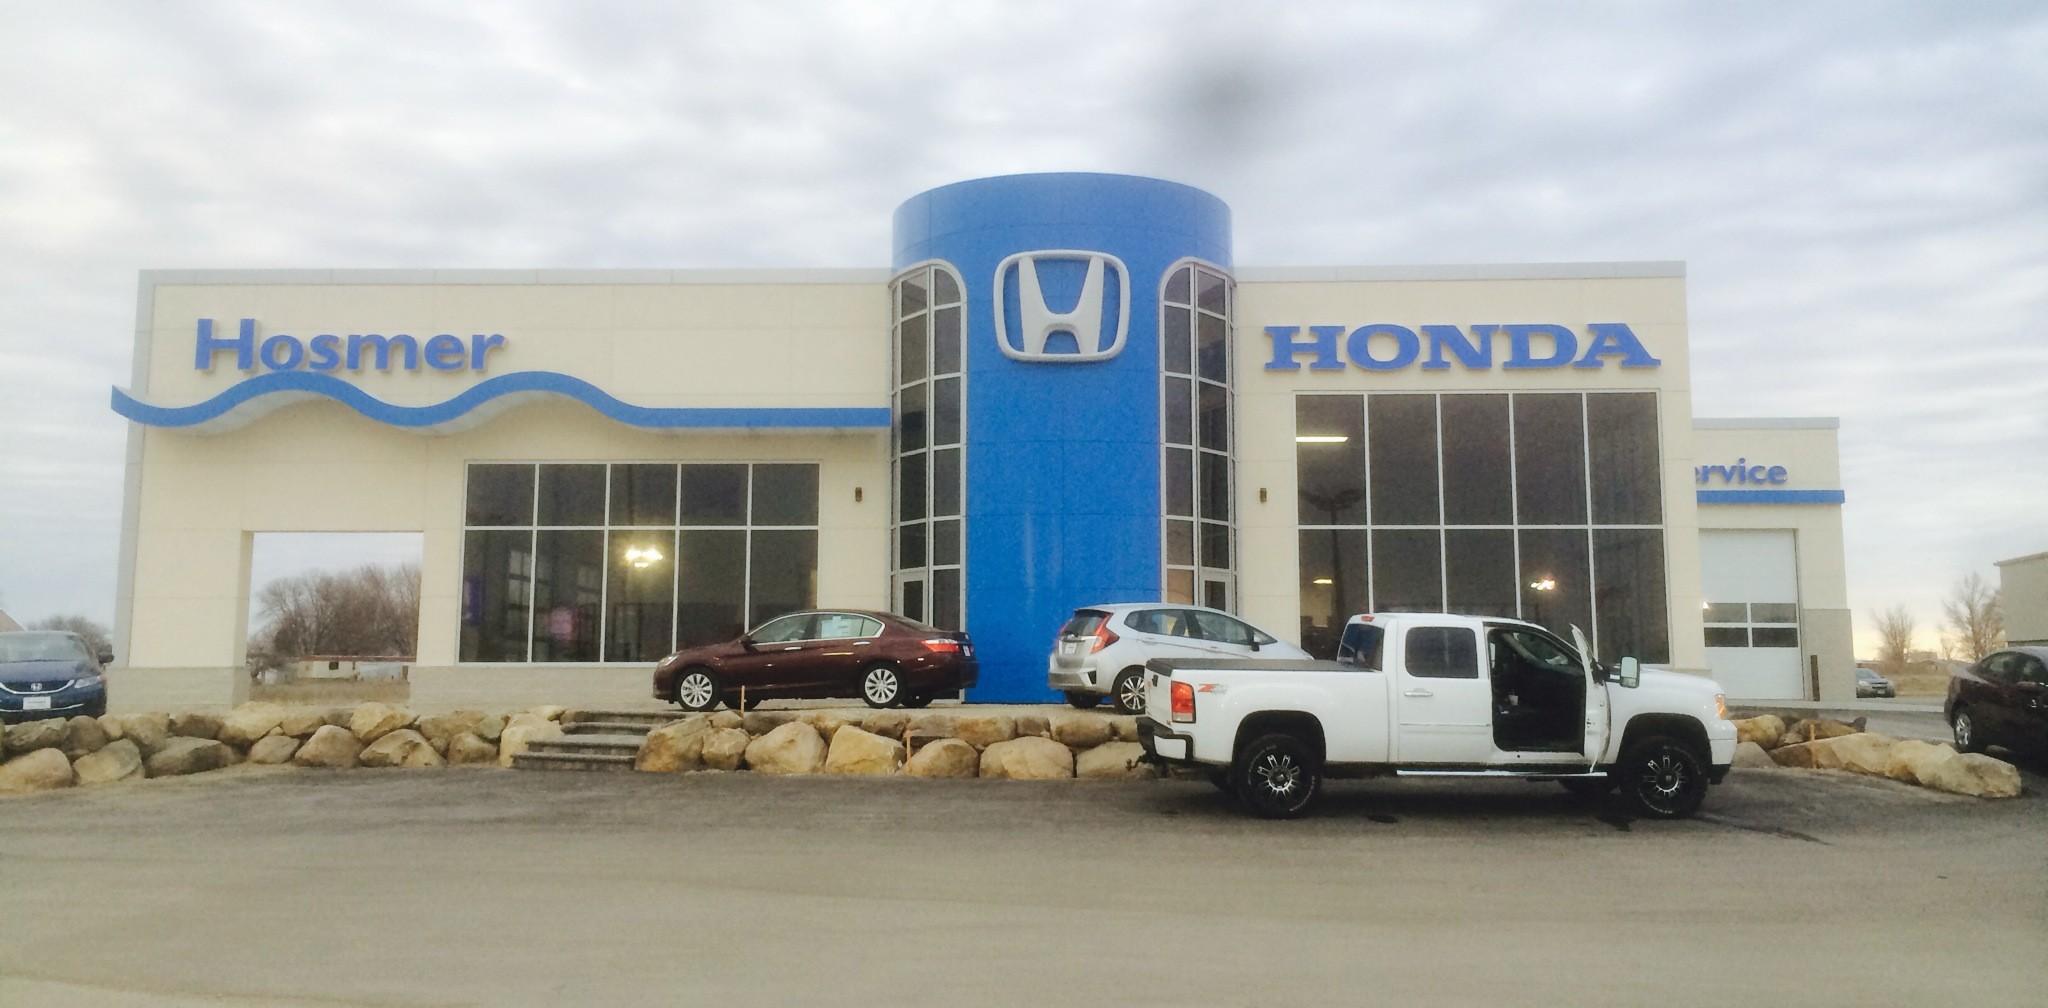 Hosmer Honda (Mason City)